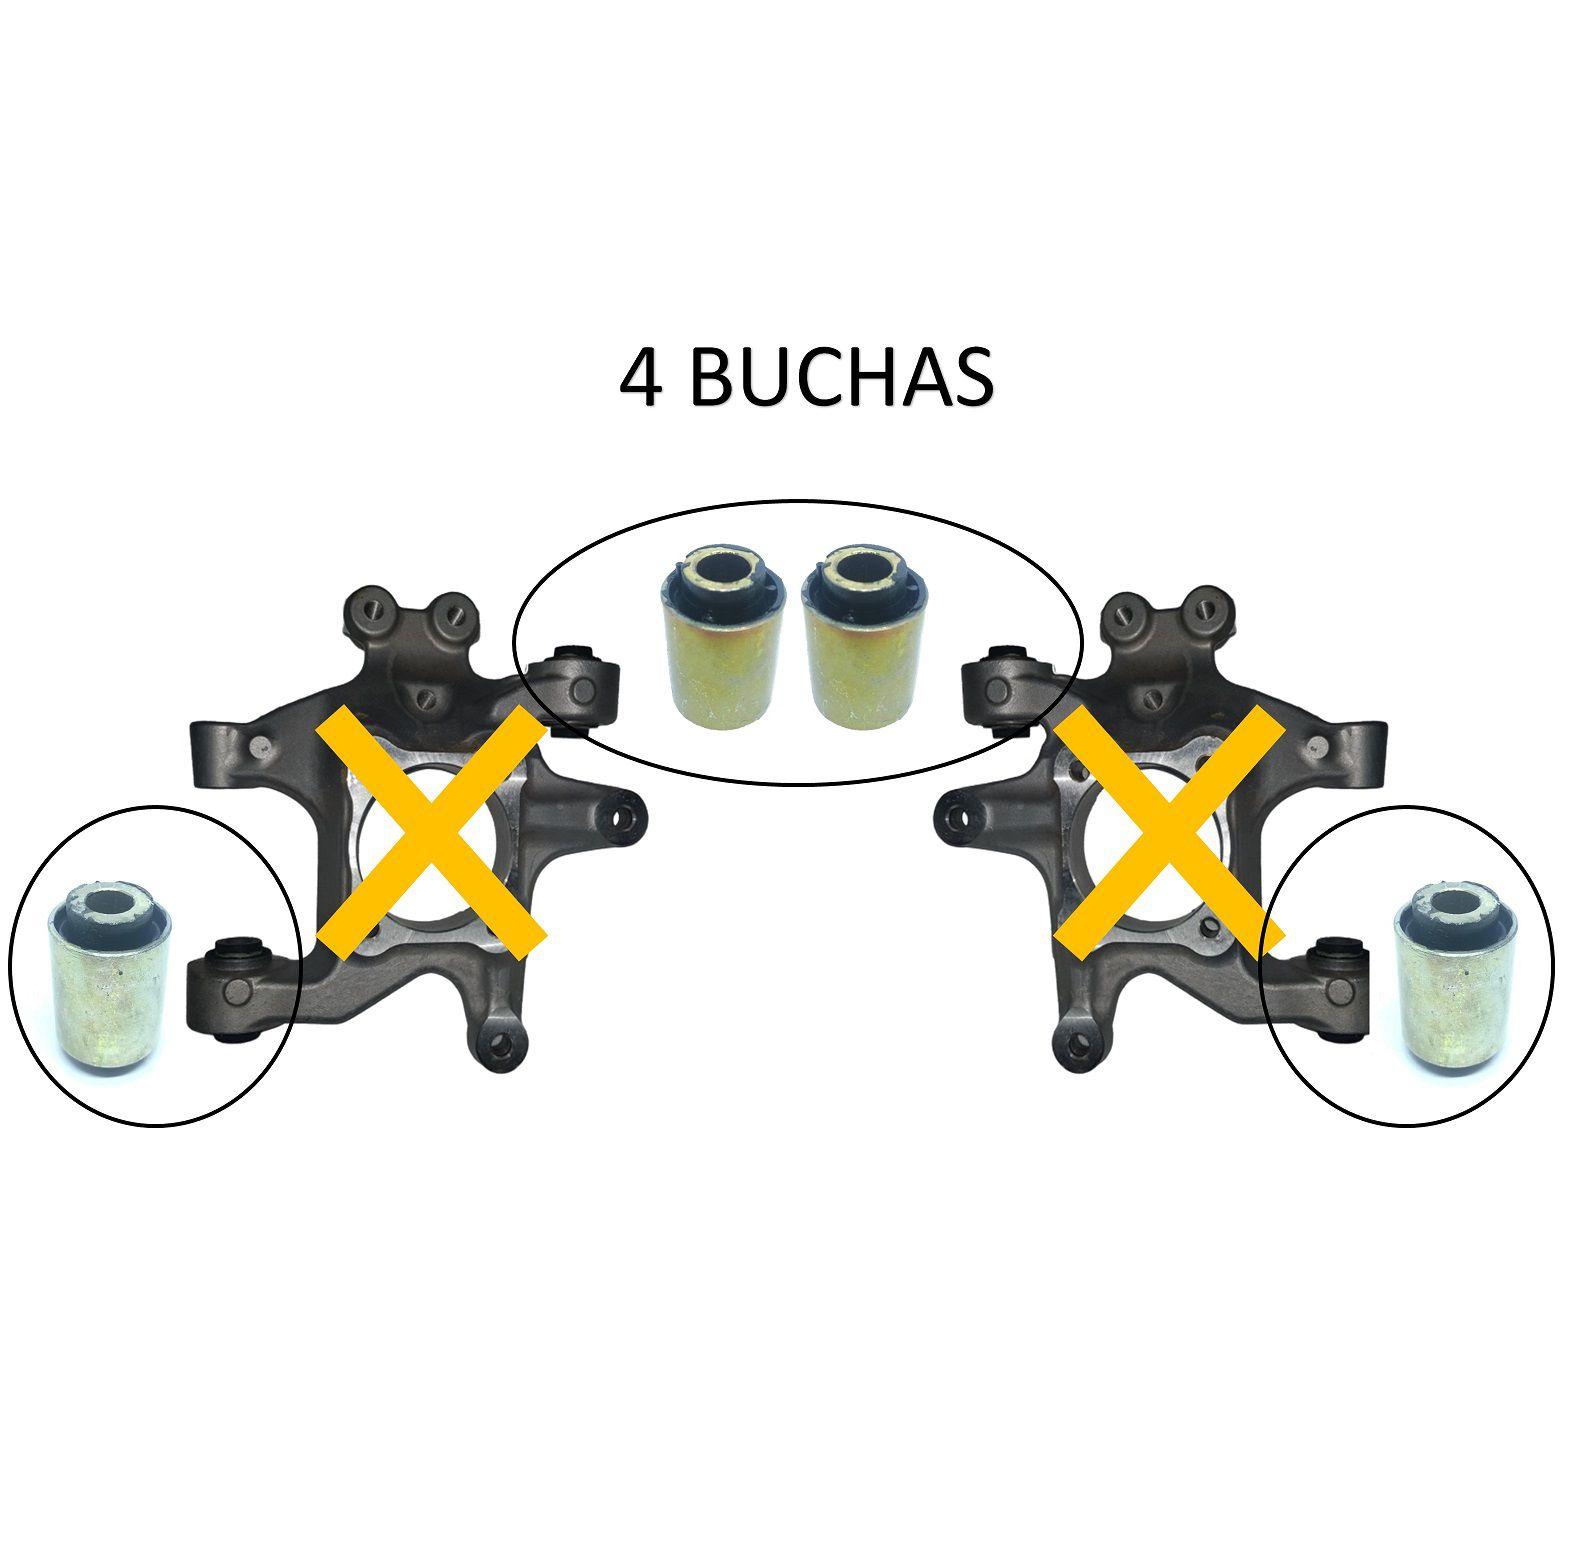 Kit Buchas Suspensão Traseira Captiva 2008 2009 2010 2011 2012 2013 2014 2015